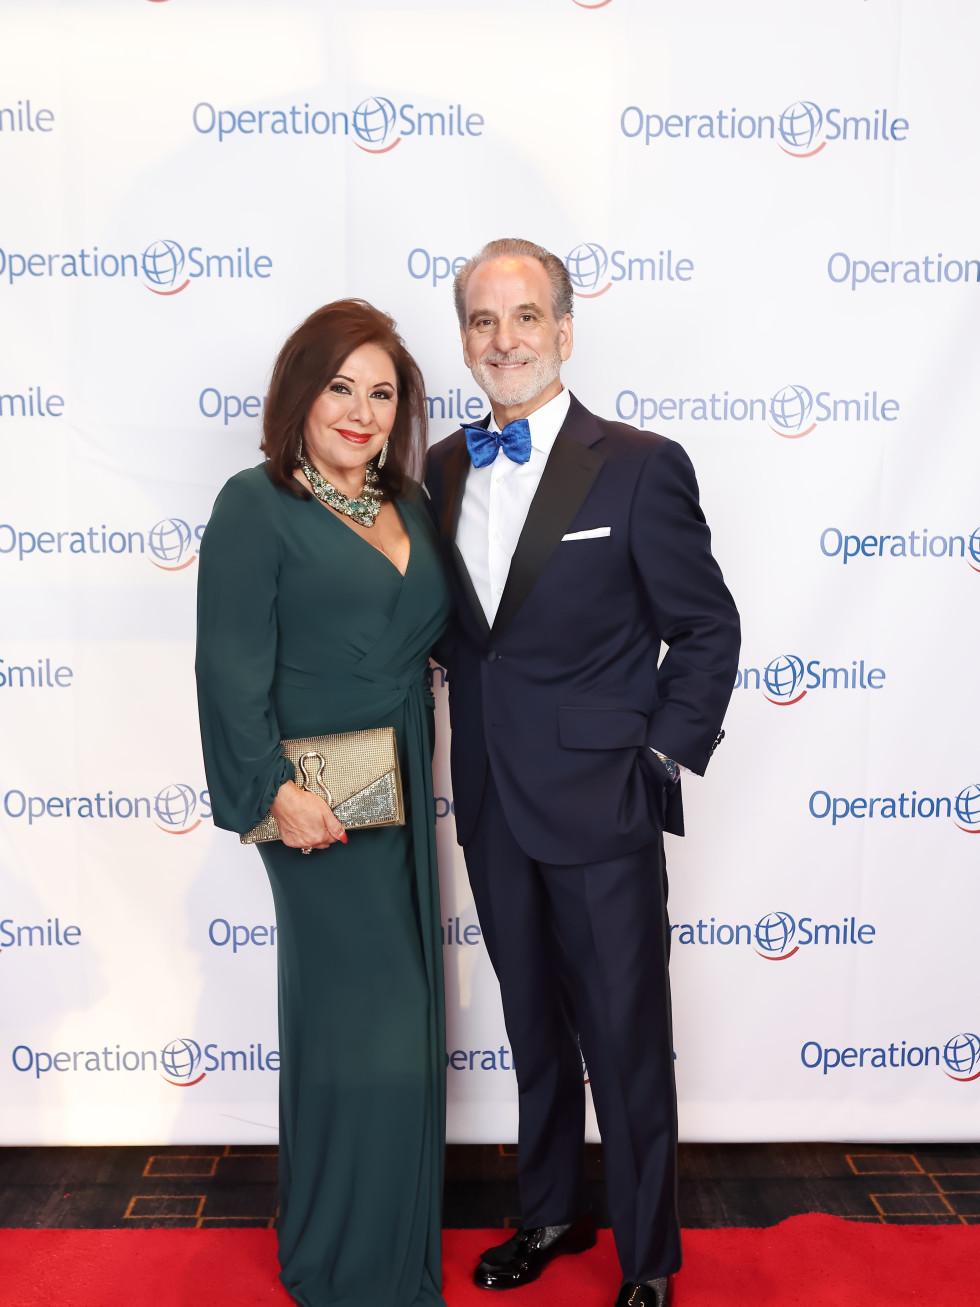 Operation Smile Gala 2021 Debbie Rudy Festari